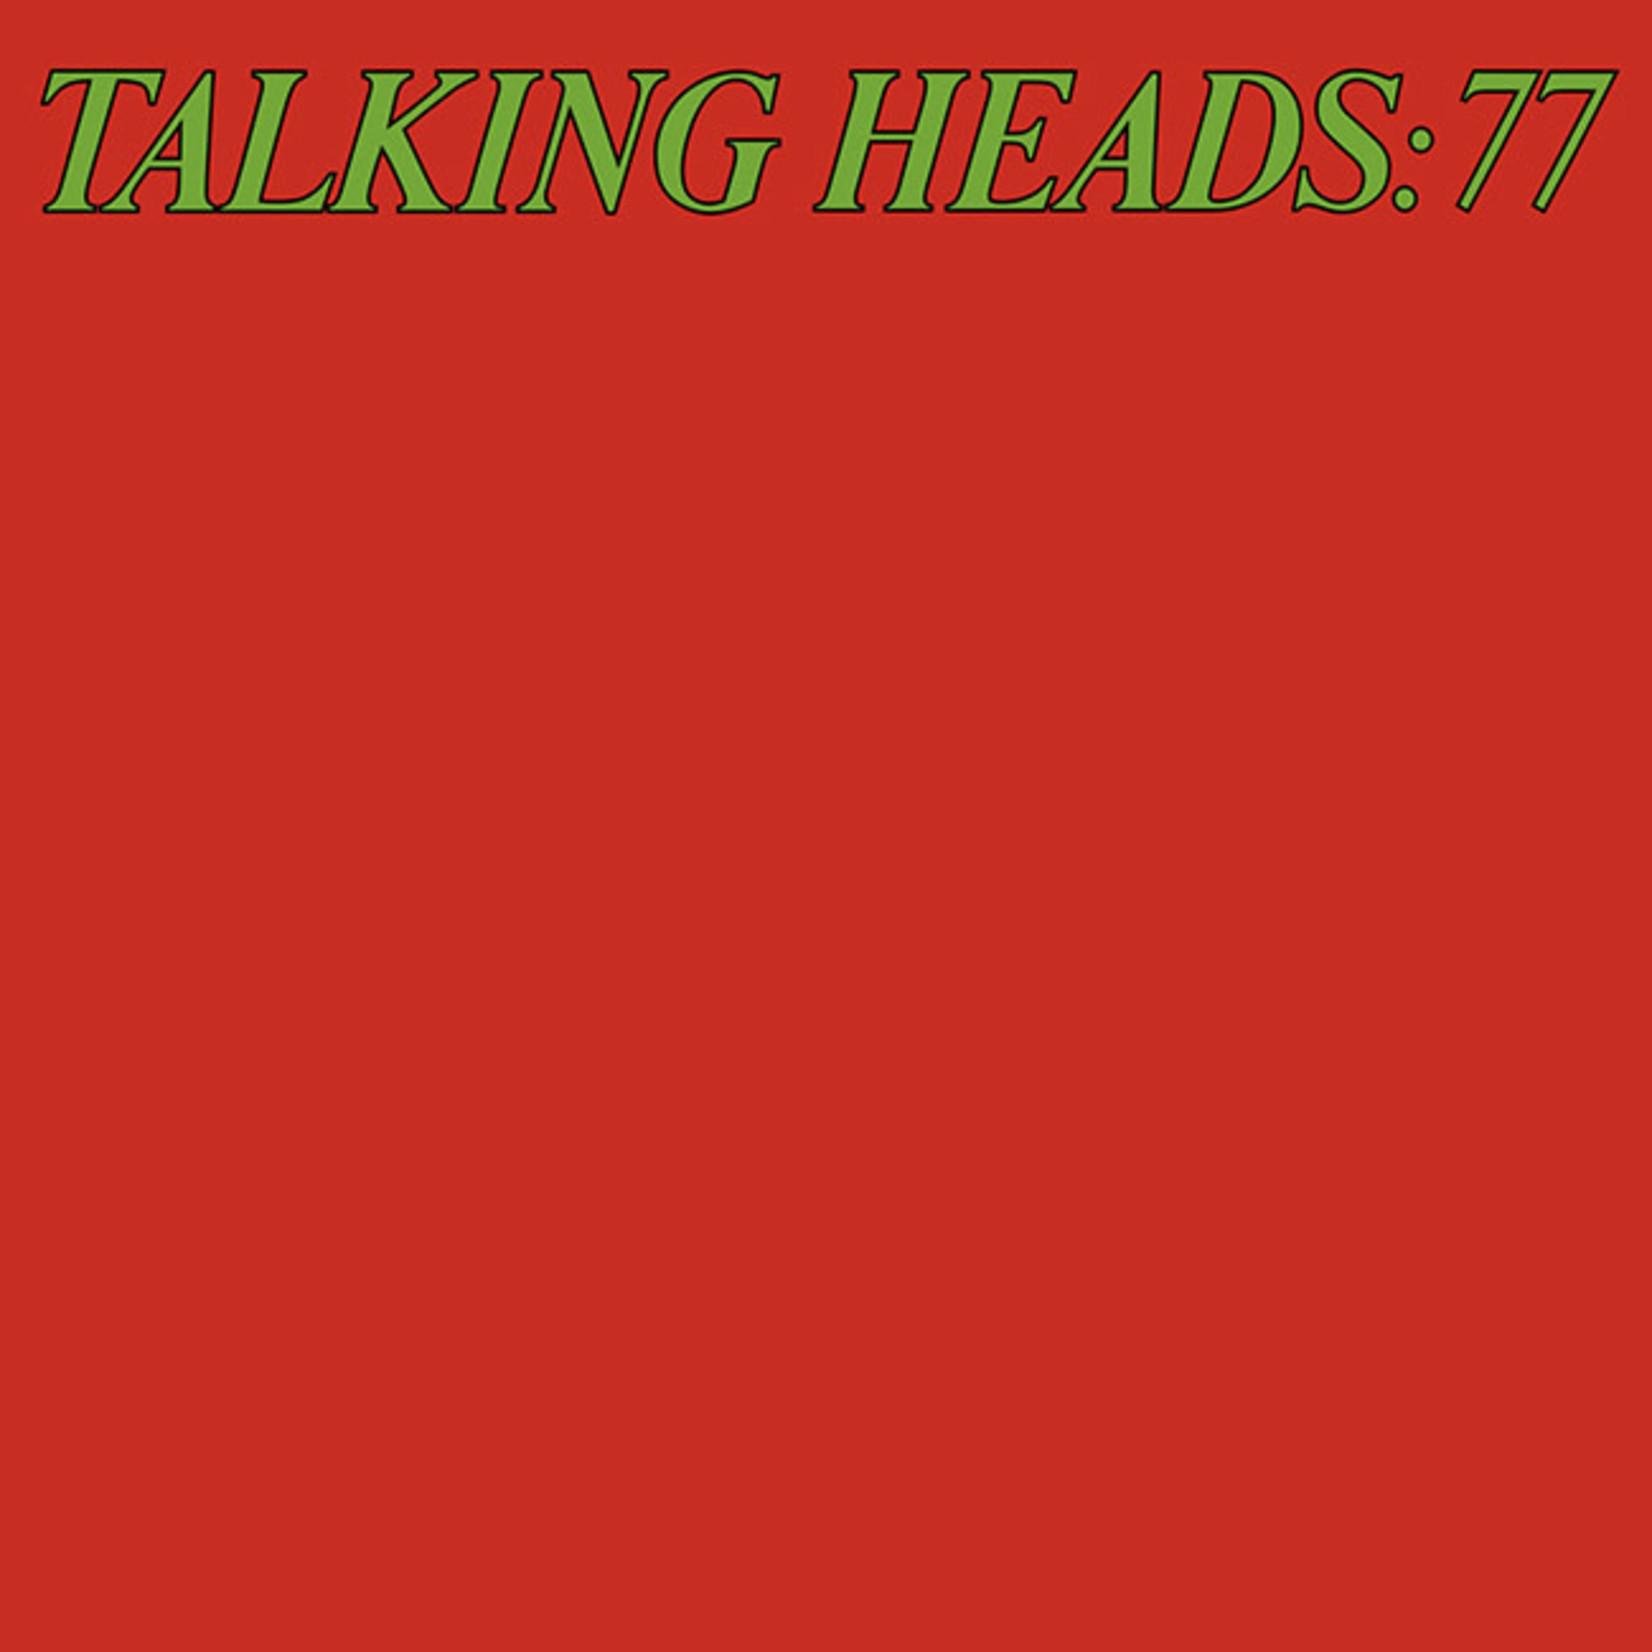 [New] Talking Heads: Talking Heads: 77 (colour vinyl)